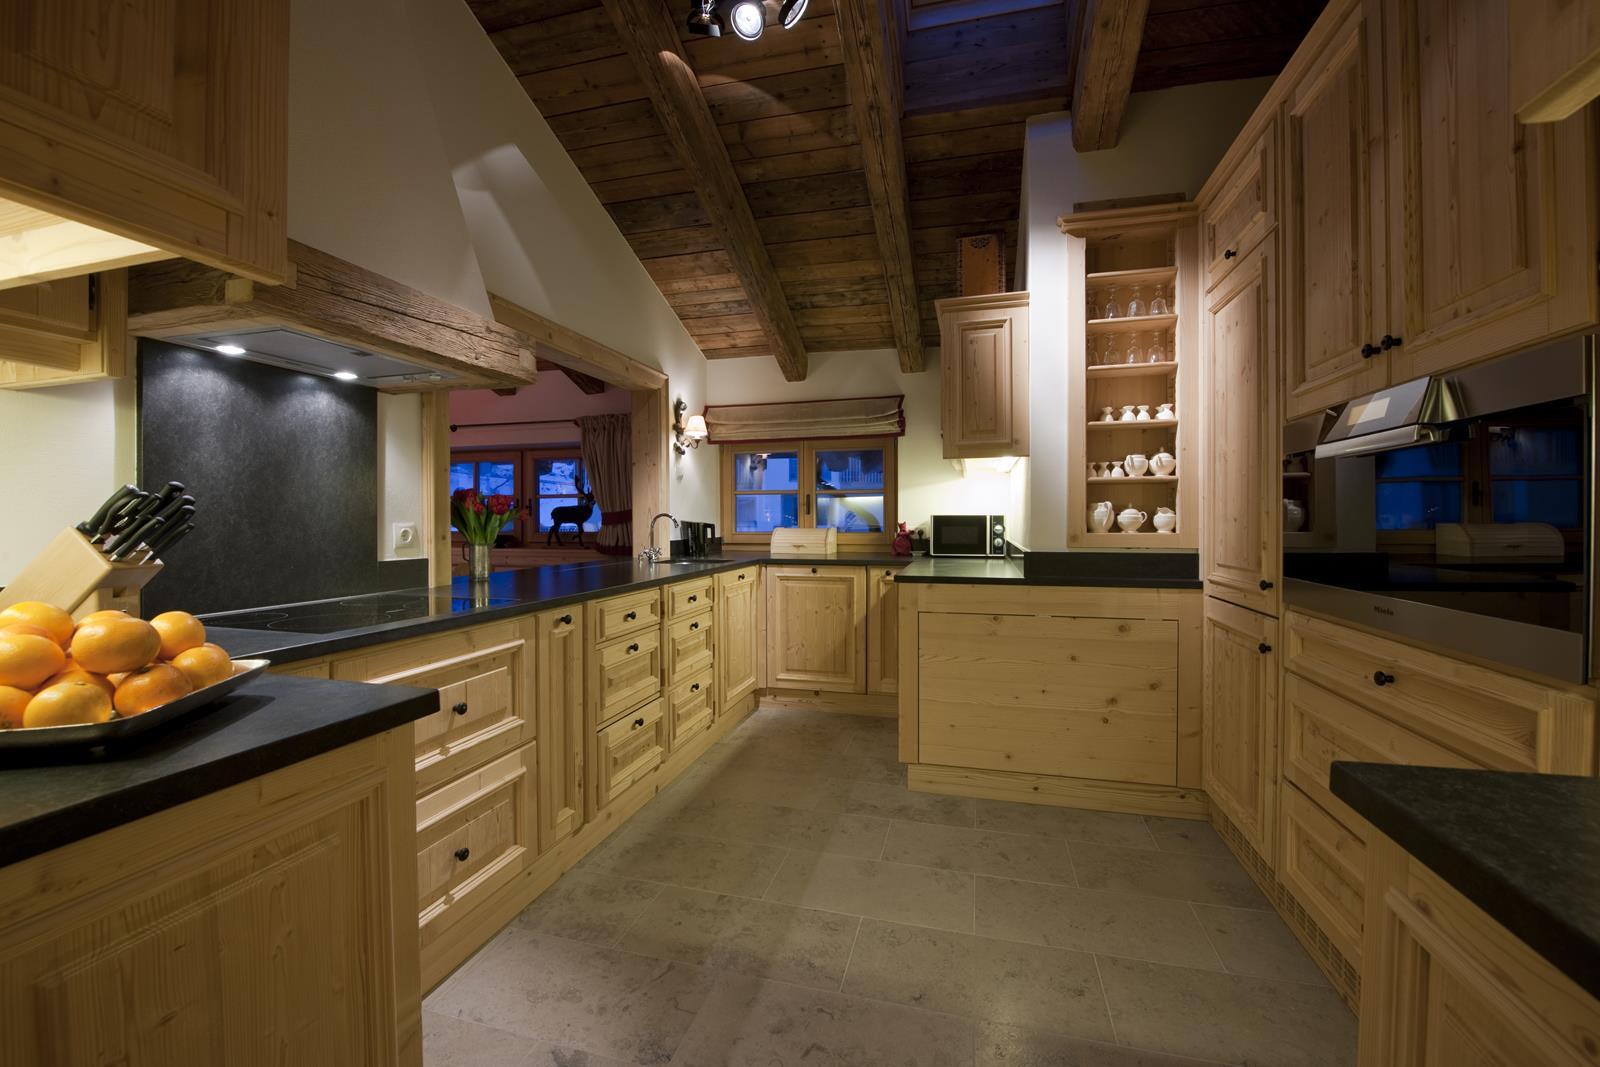 chalet-antoinette-kitchen-2